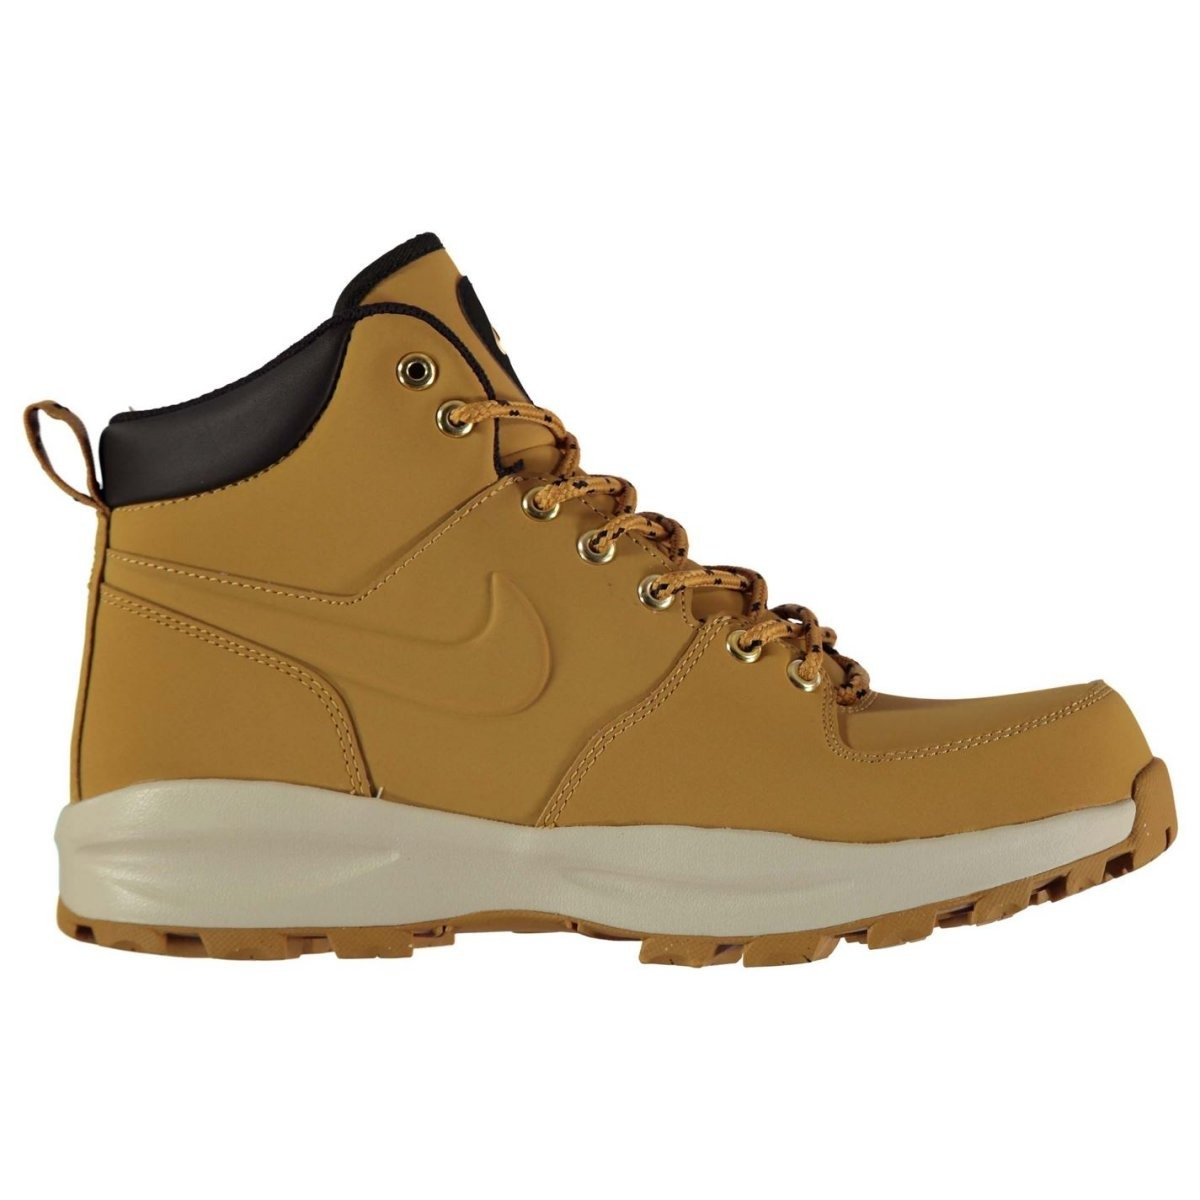 Bota Masculina Nike Manoa Leather 454350-700  b11a5609ac555